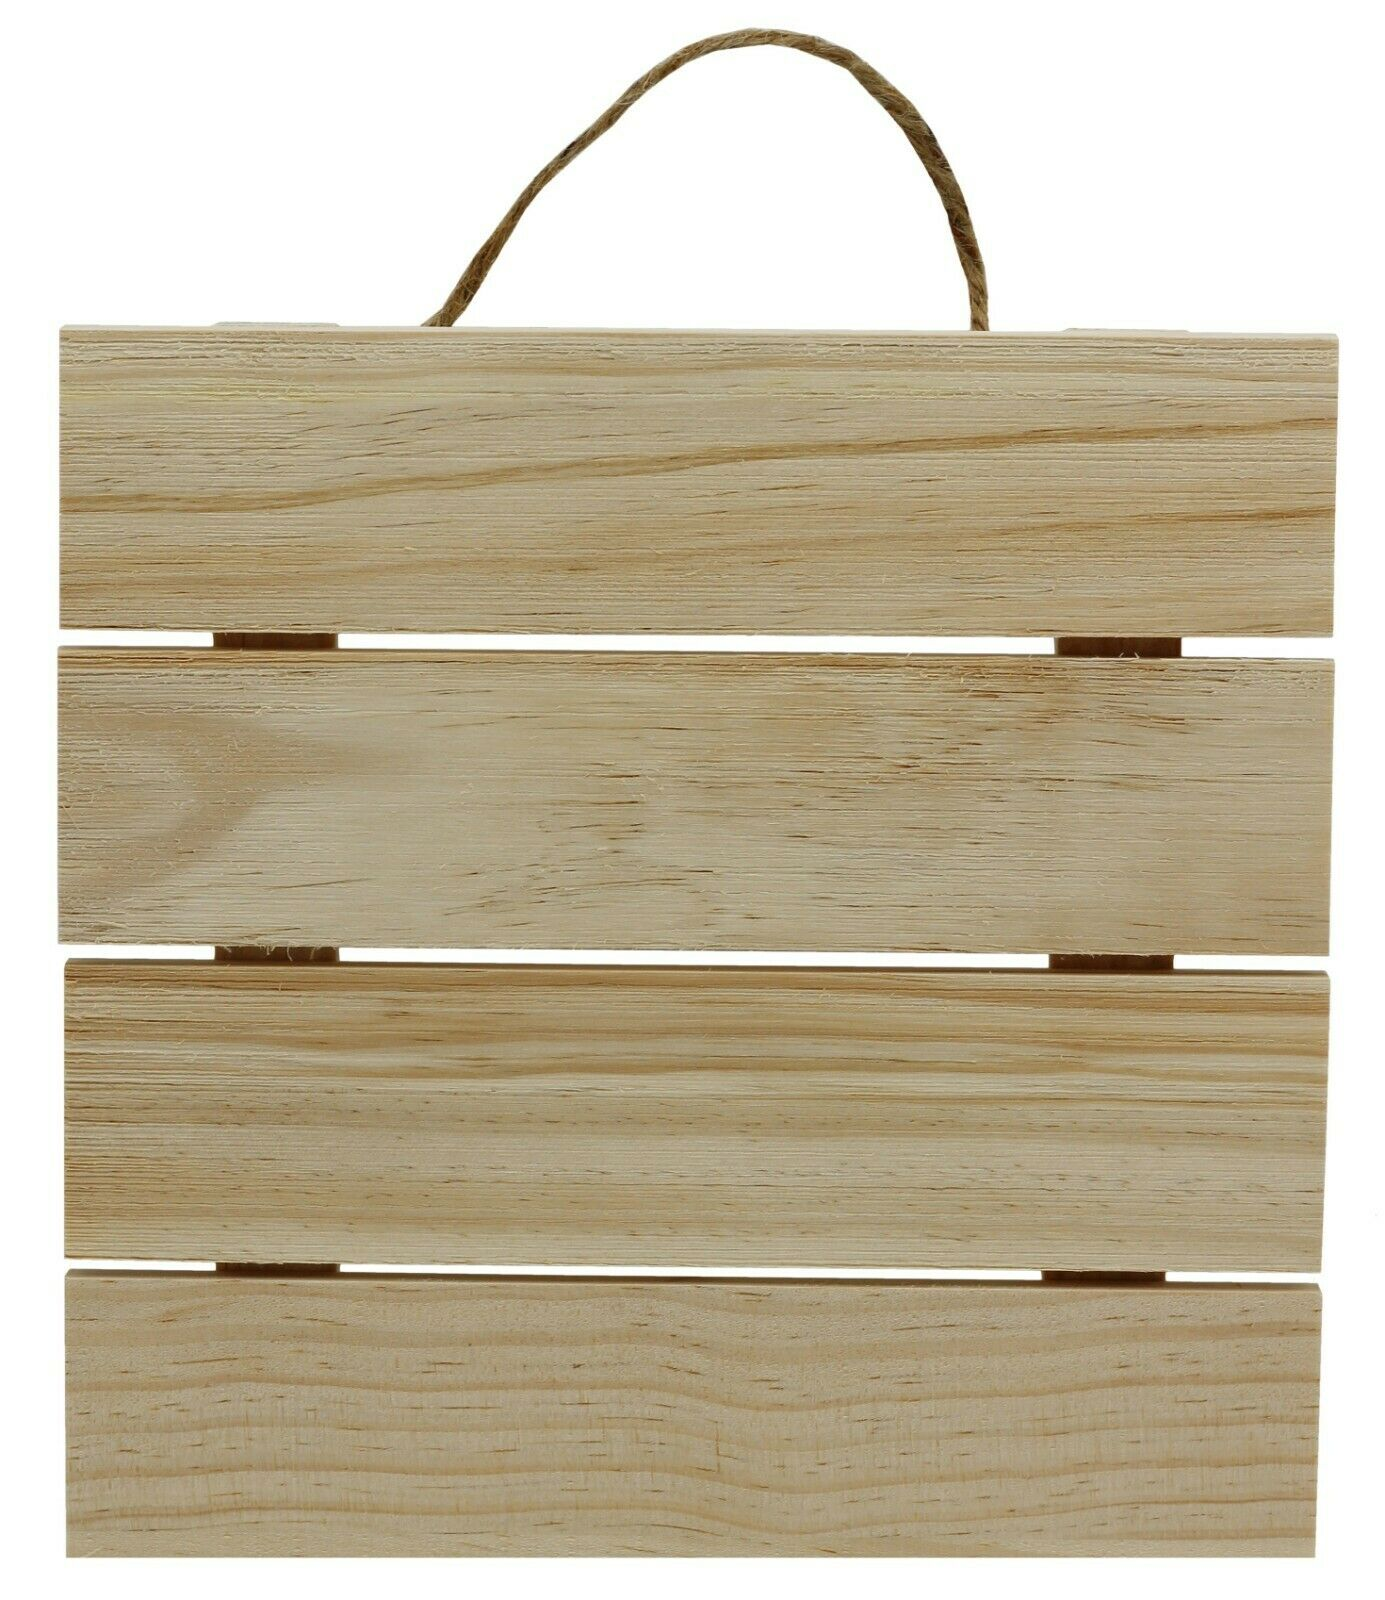 10×10″ Unfinished Wood Hanging Plaque, DIY Wood Pallet Sign, Decorative Plaque Crafts